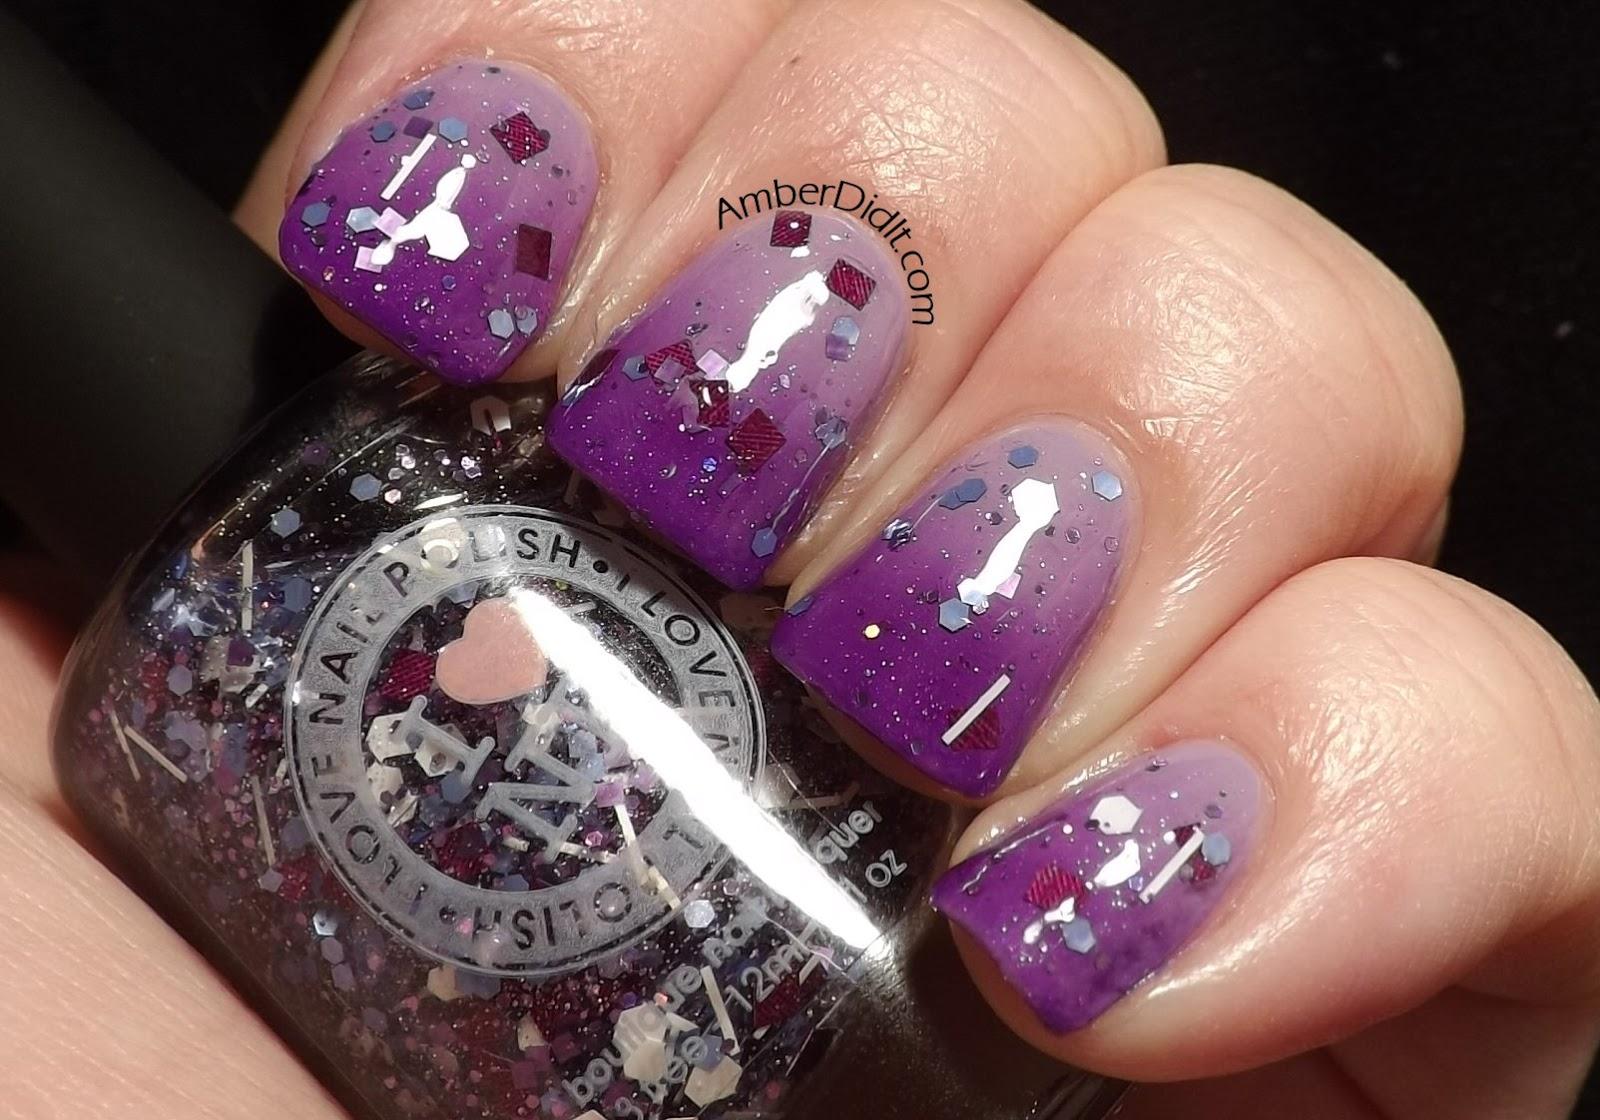 Amber did it!: I Love Nail Polish Purple Stuff~Swatches